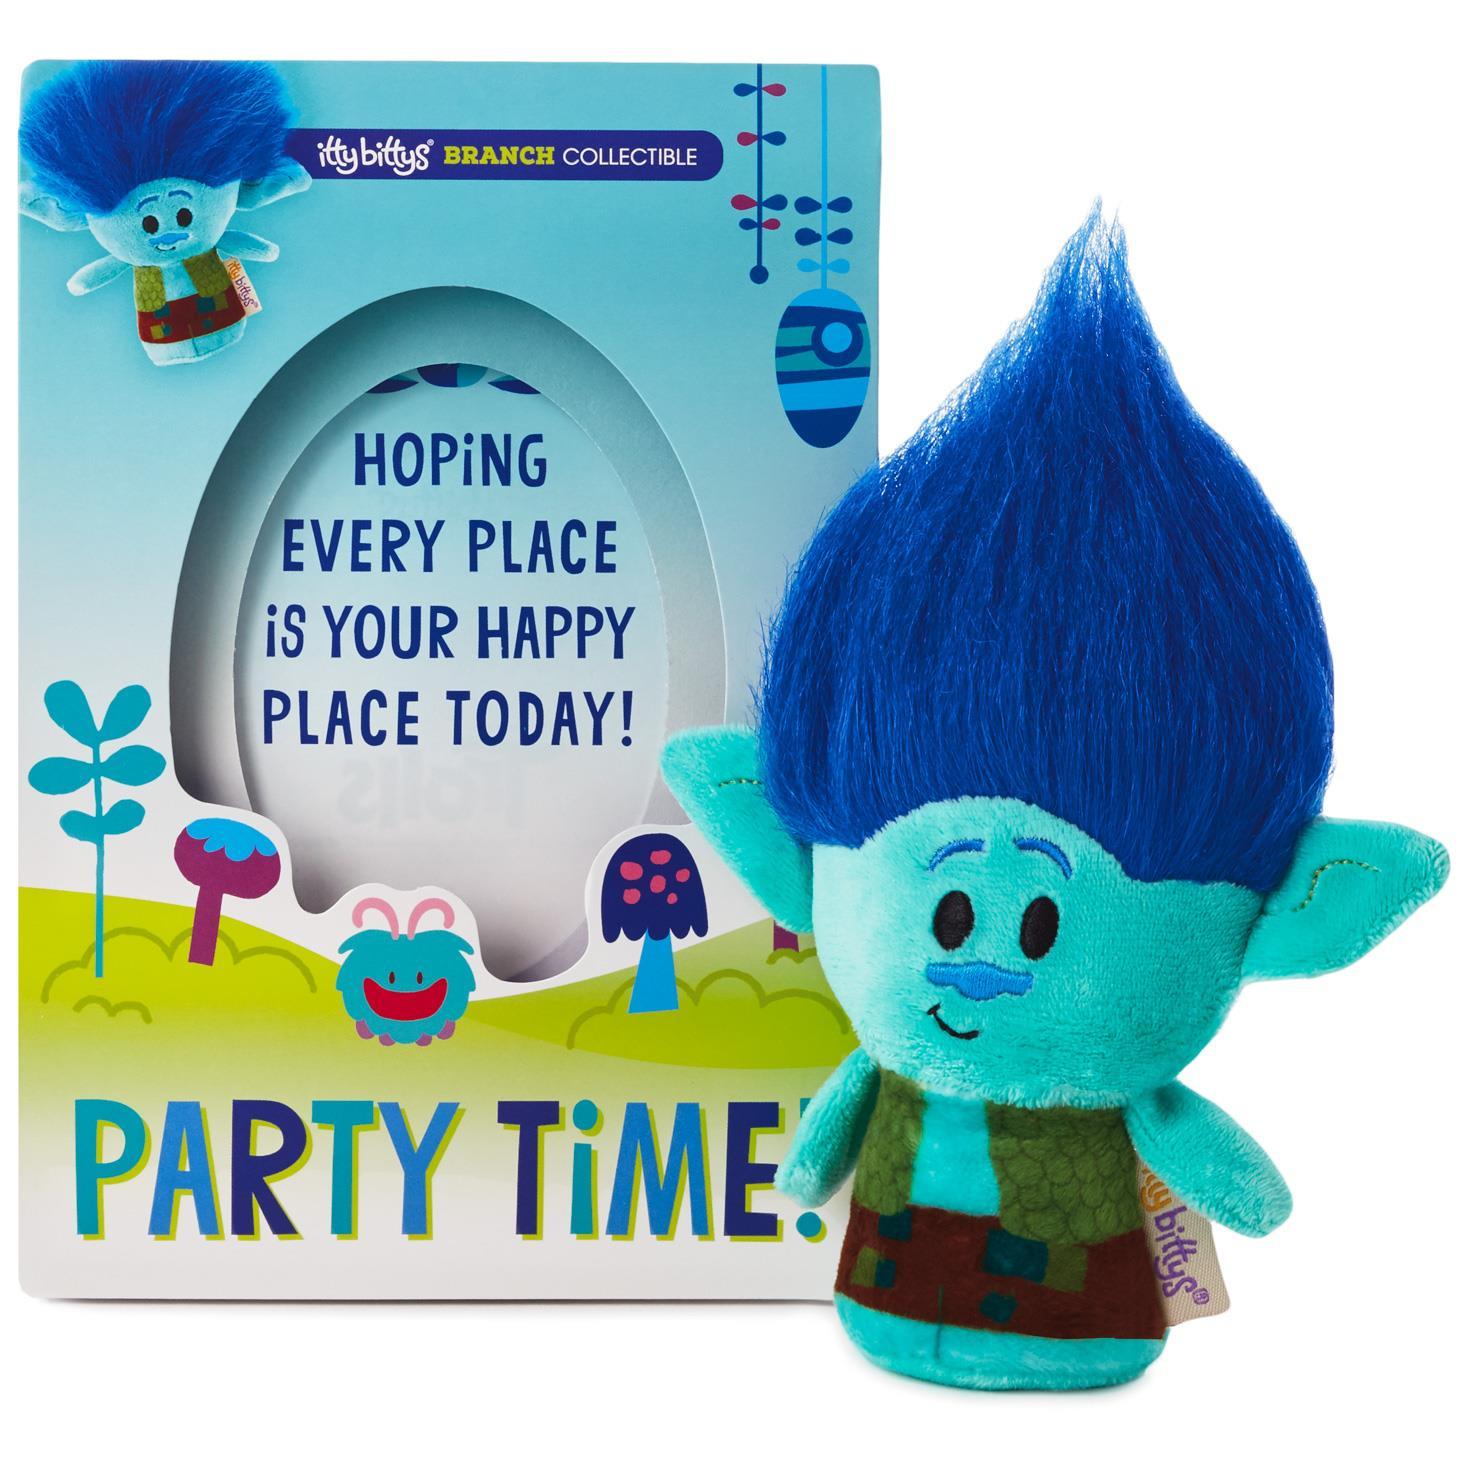 itty bittys DreamWorks Trolls Branch Birthday Card With Stuffed